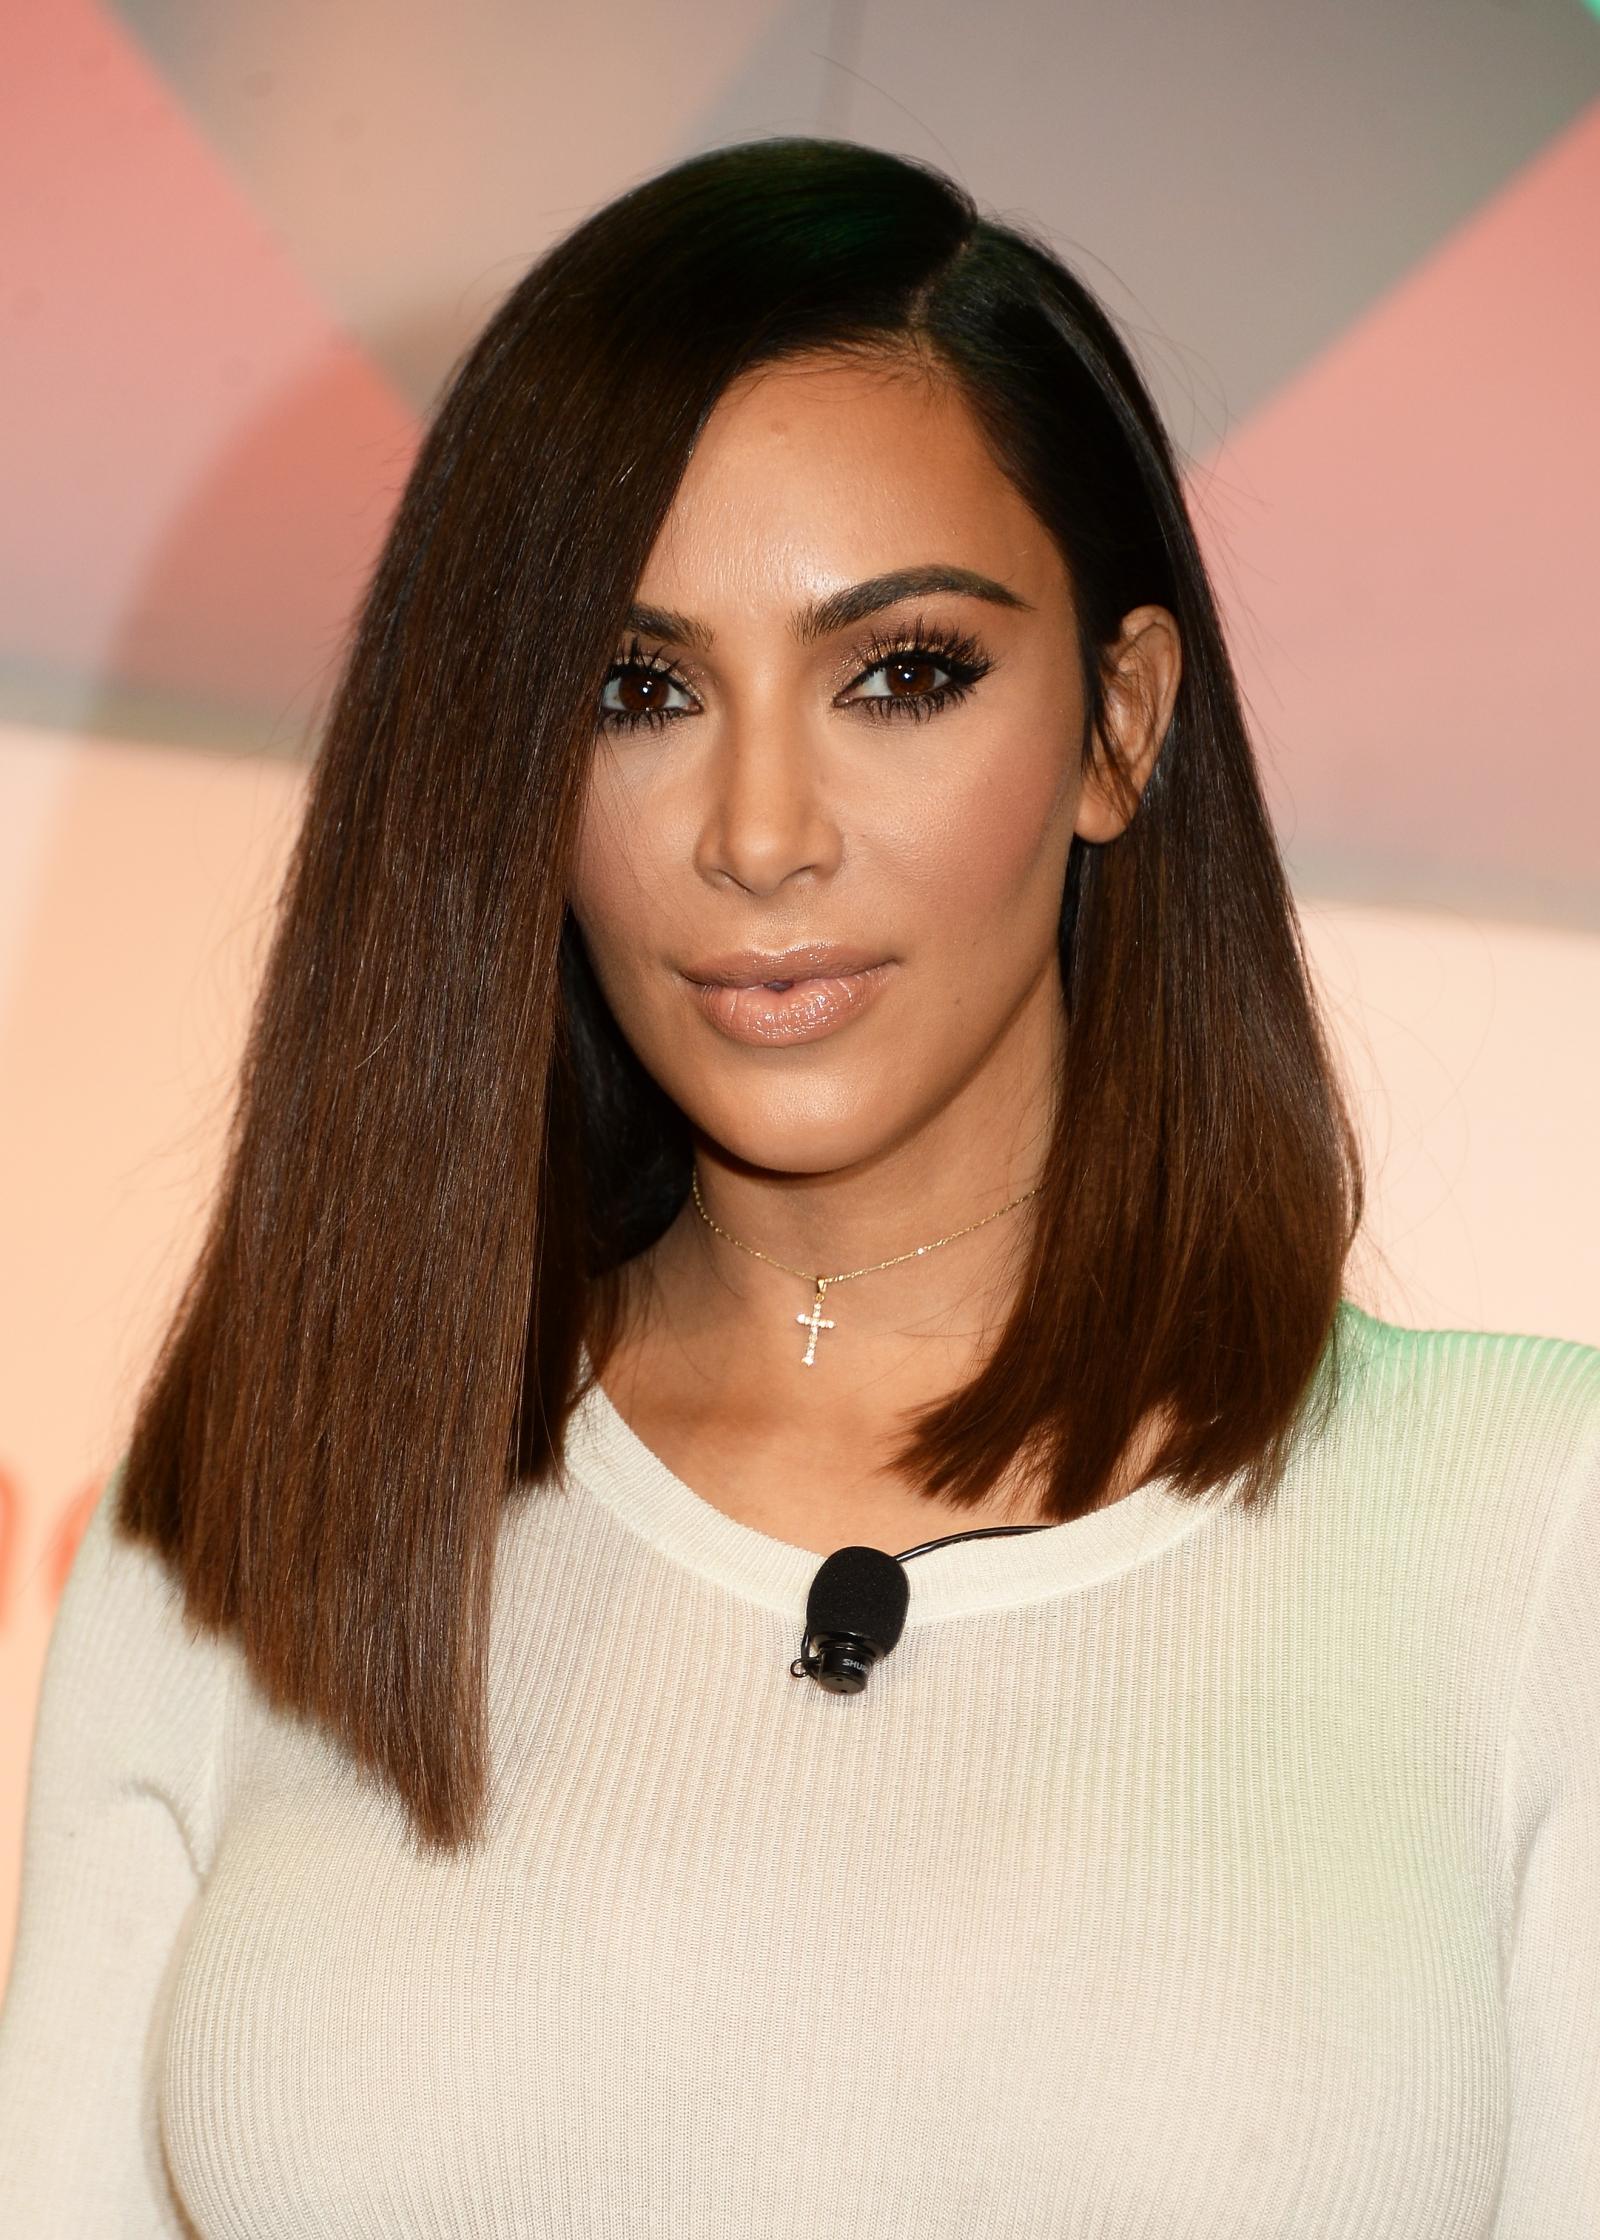 Kim Kardashian Gunpoint Robbery Was A Publicity Stunt